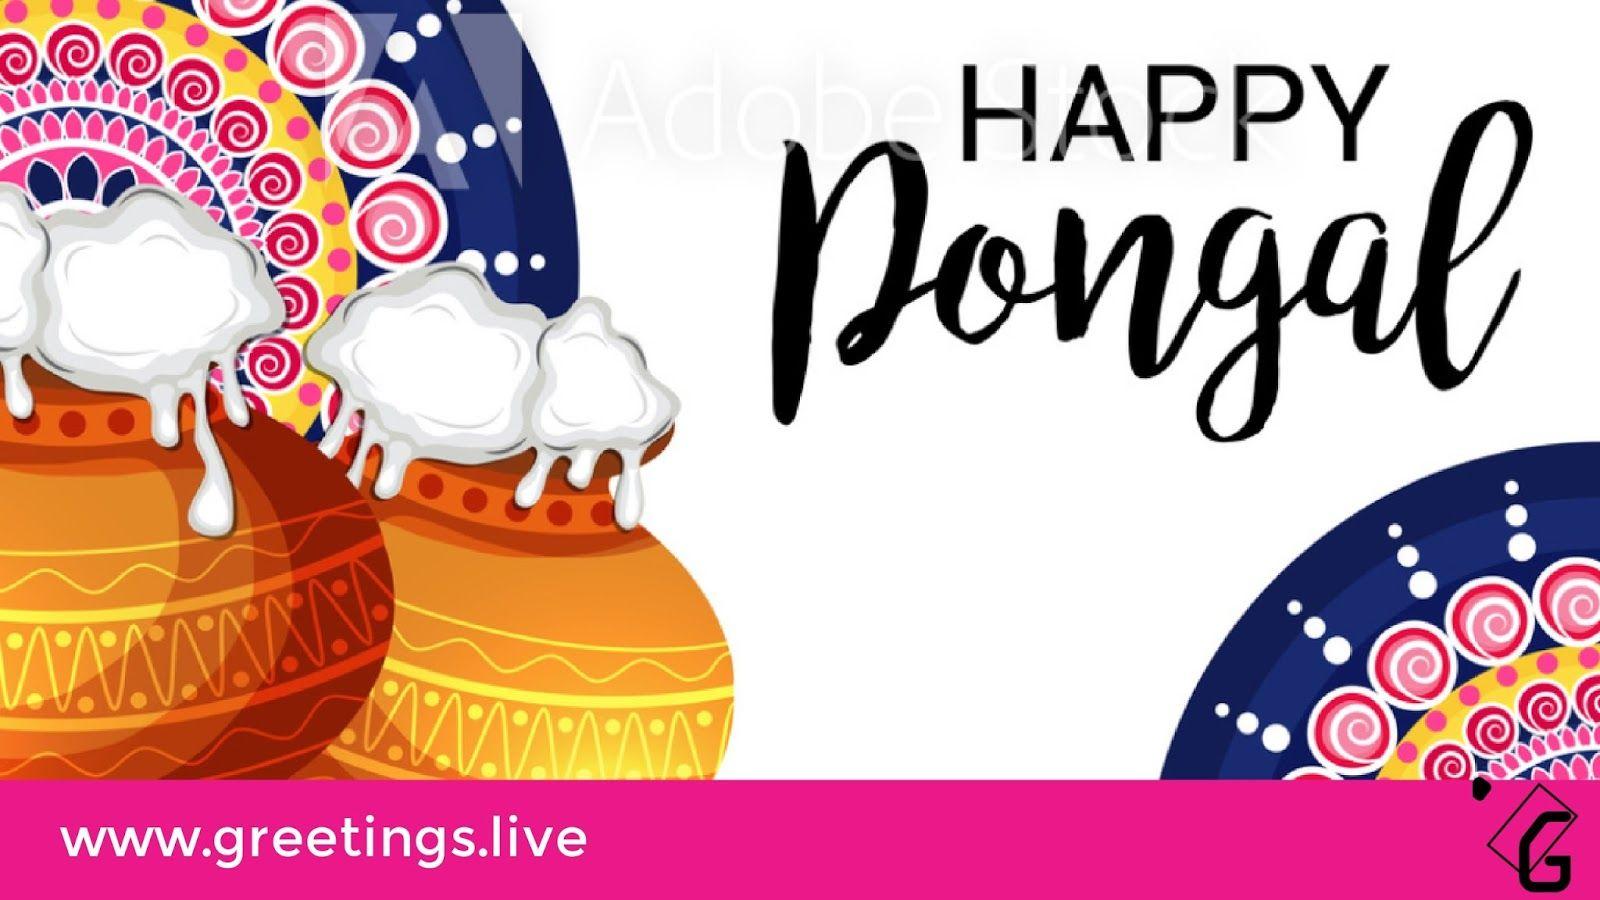 Happy Pongal Festival Greetings 2018 Festivals Greetings